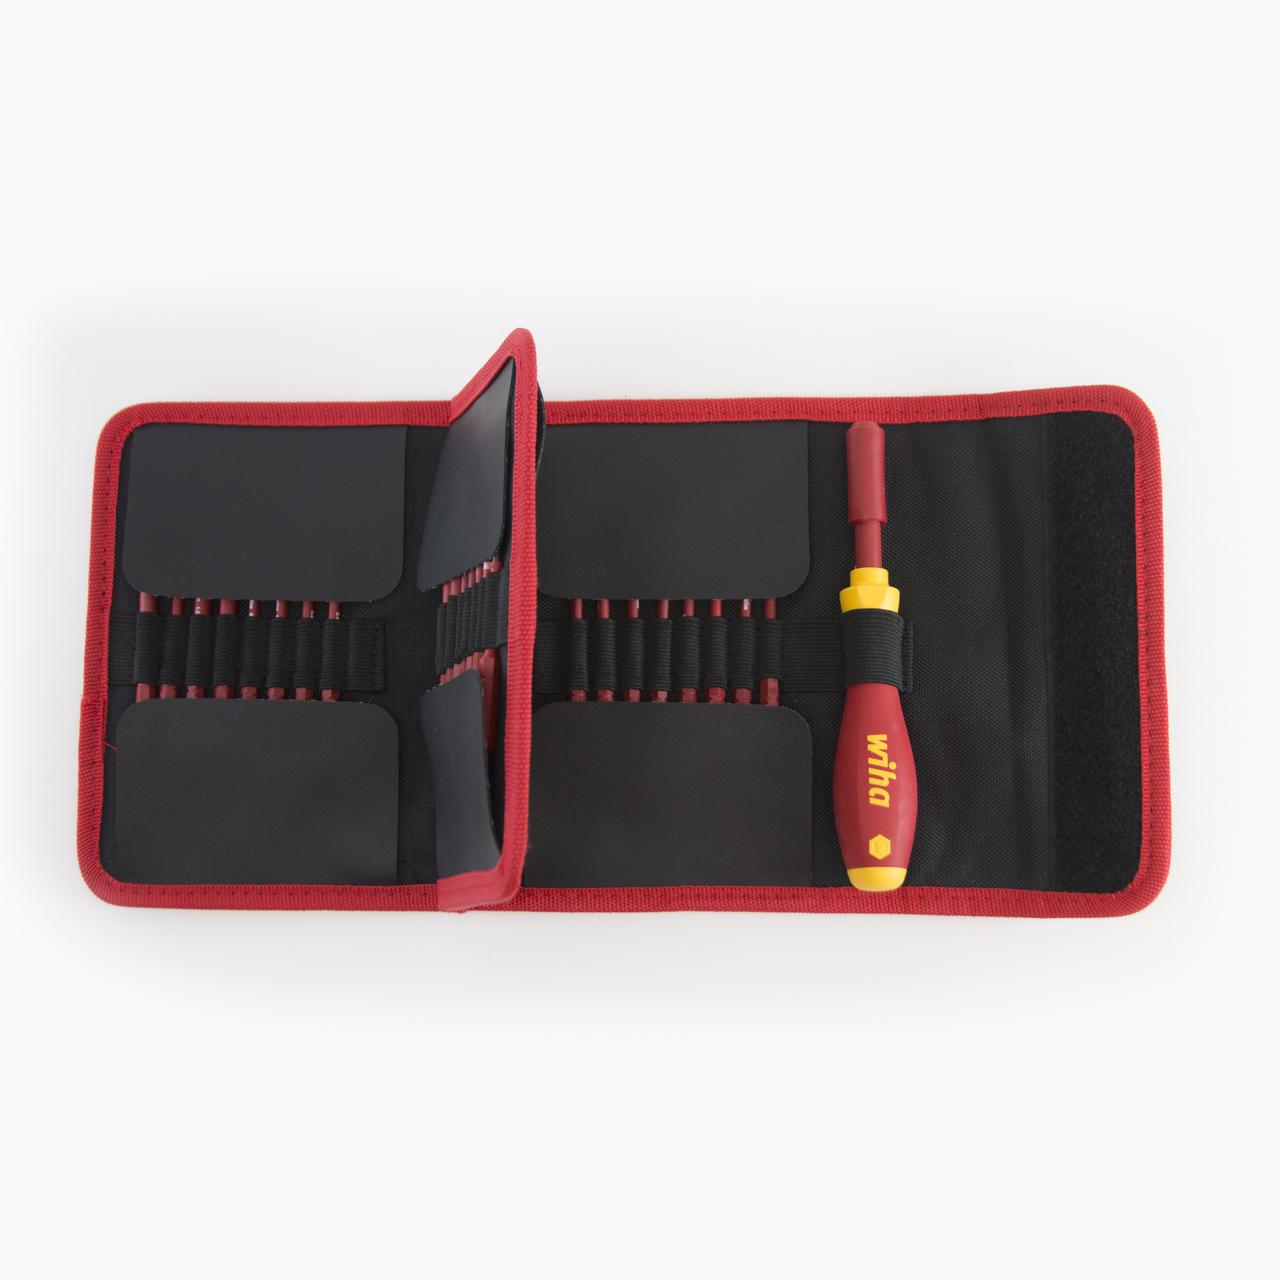 Wiha 28399 30 Piece Insulated SlimLine Blade Pouch Set - KC Tool